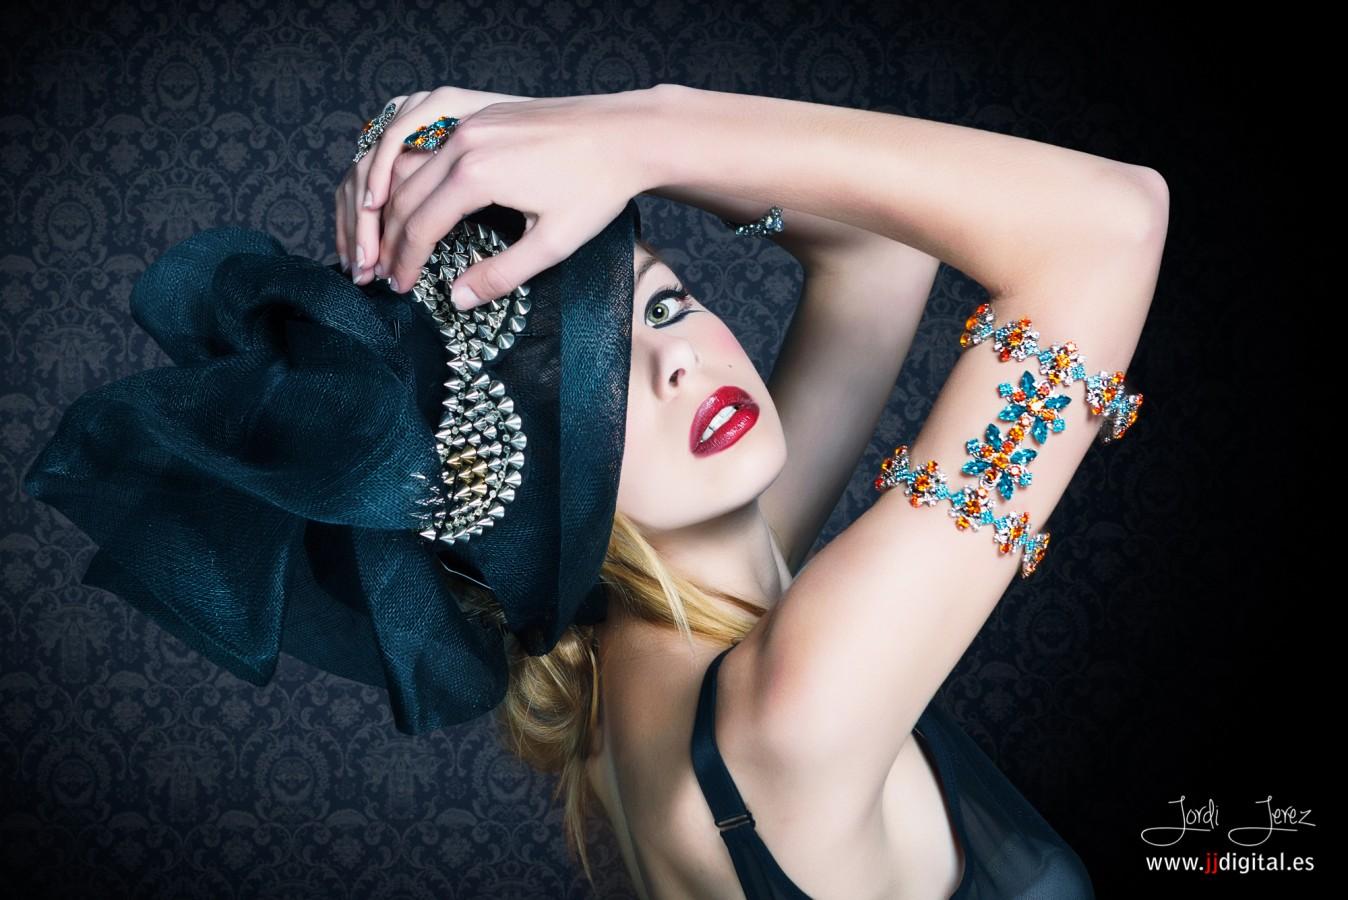 Sesión Beauty - Jordi Jerez - Claudia Mahalean